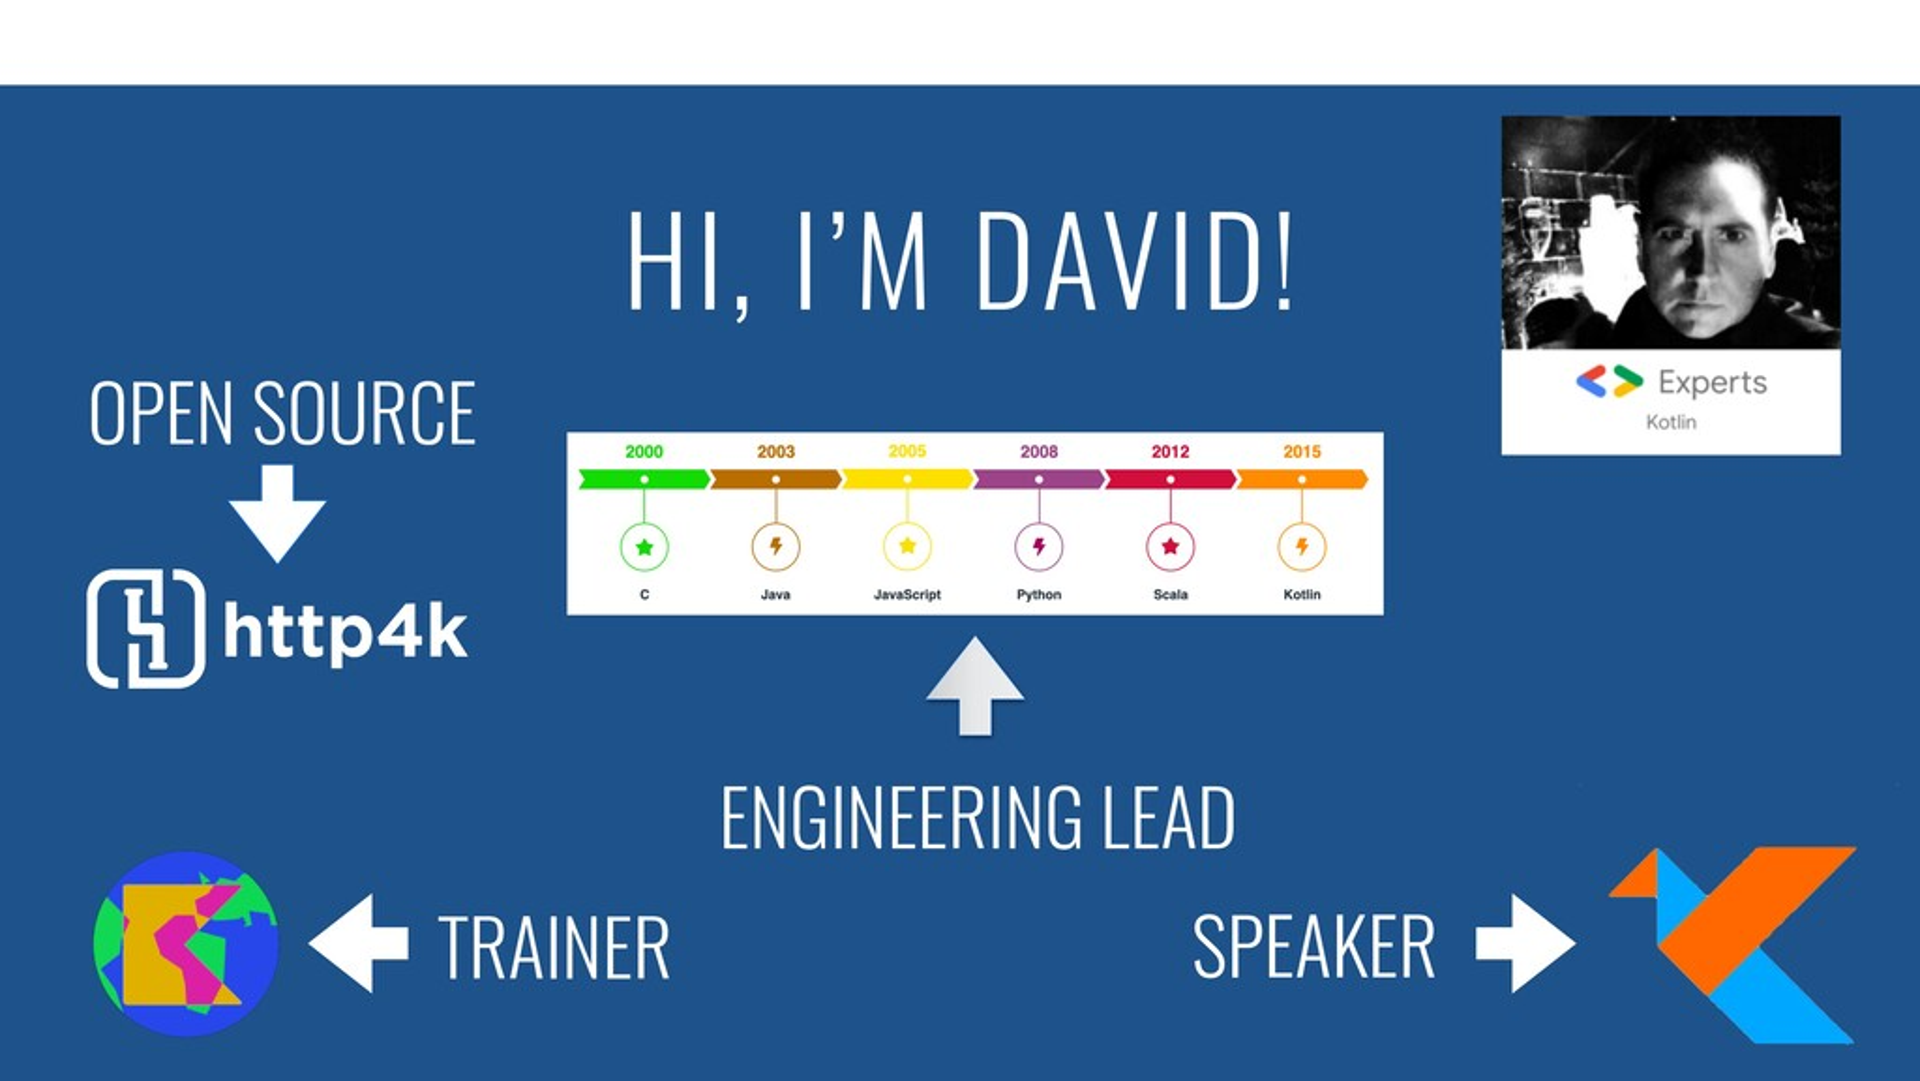 HI, I'M DAVID! TRAINER OPEN SOURCE ENGINEERING ...